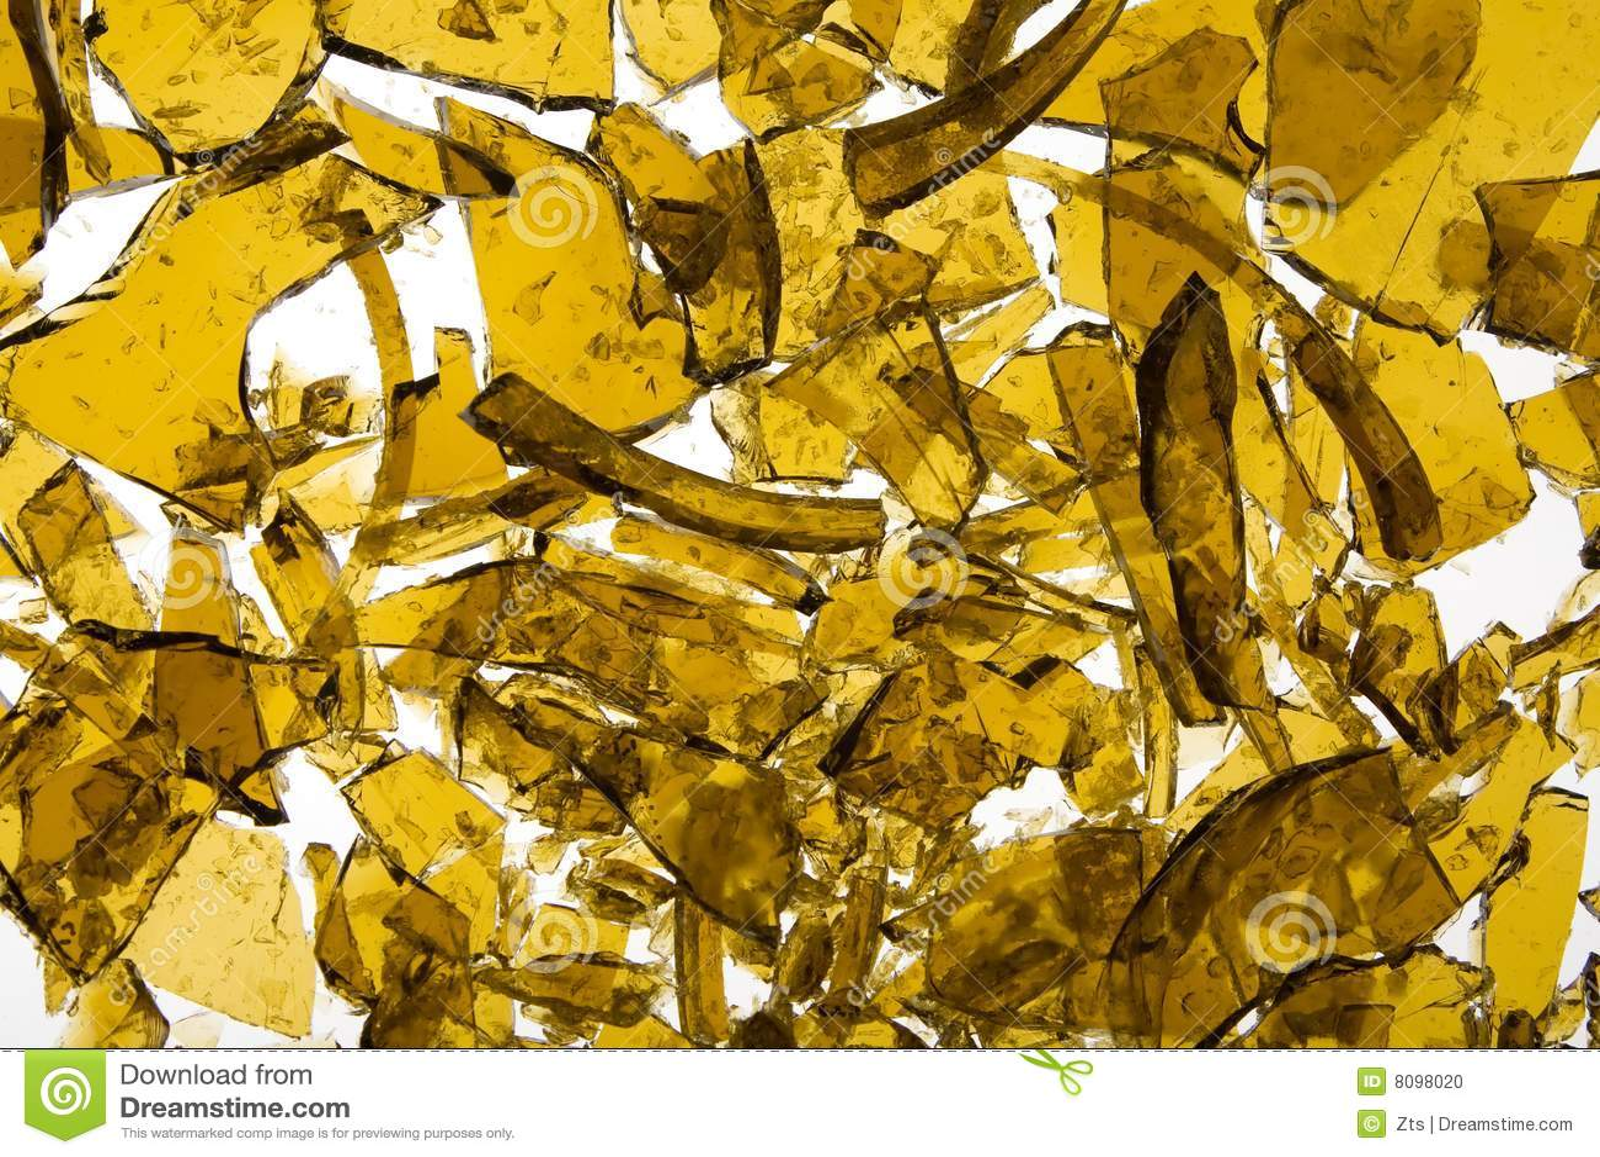 Close Up Broken Yellow Floo Royalty Free Stock Photo